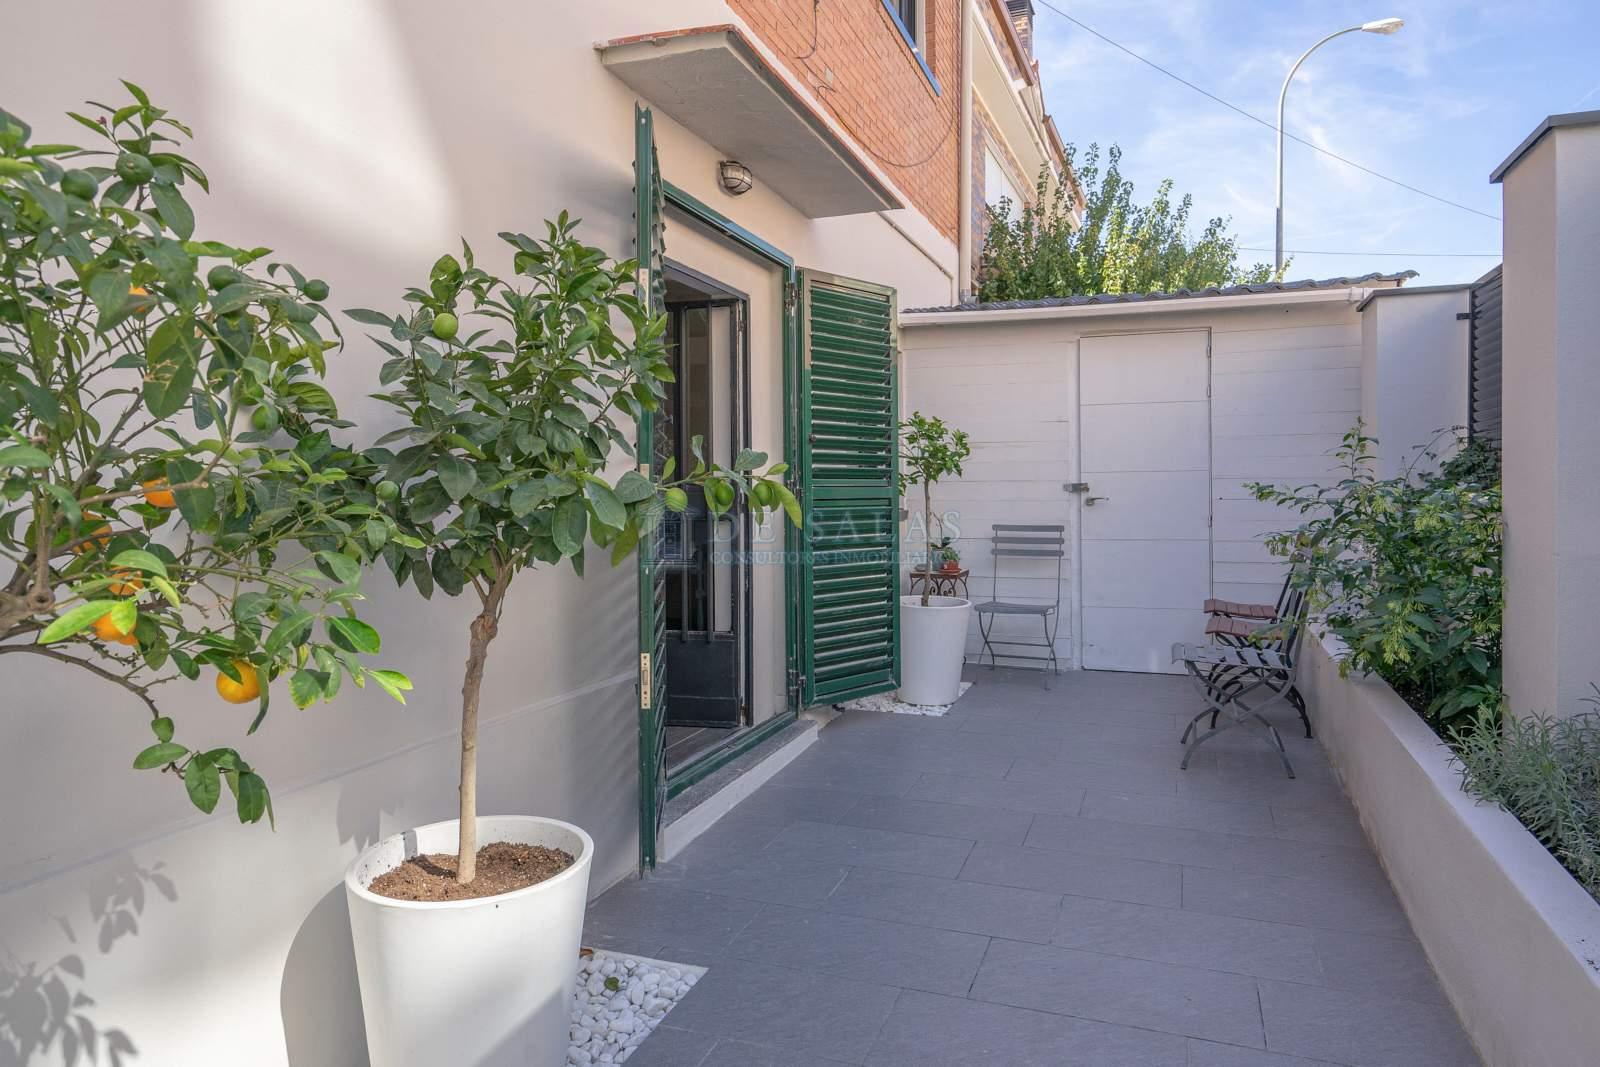 07 Maison Arturo Soria